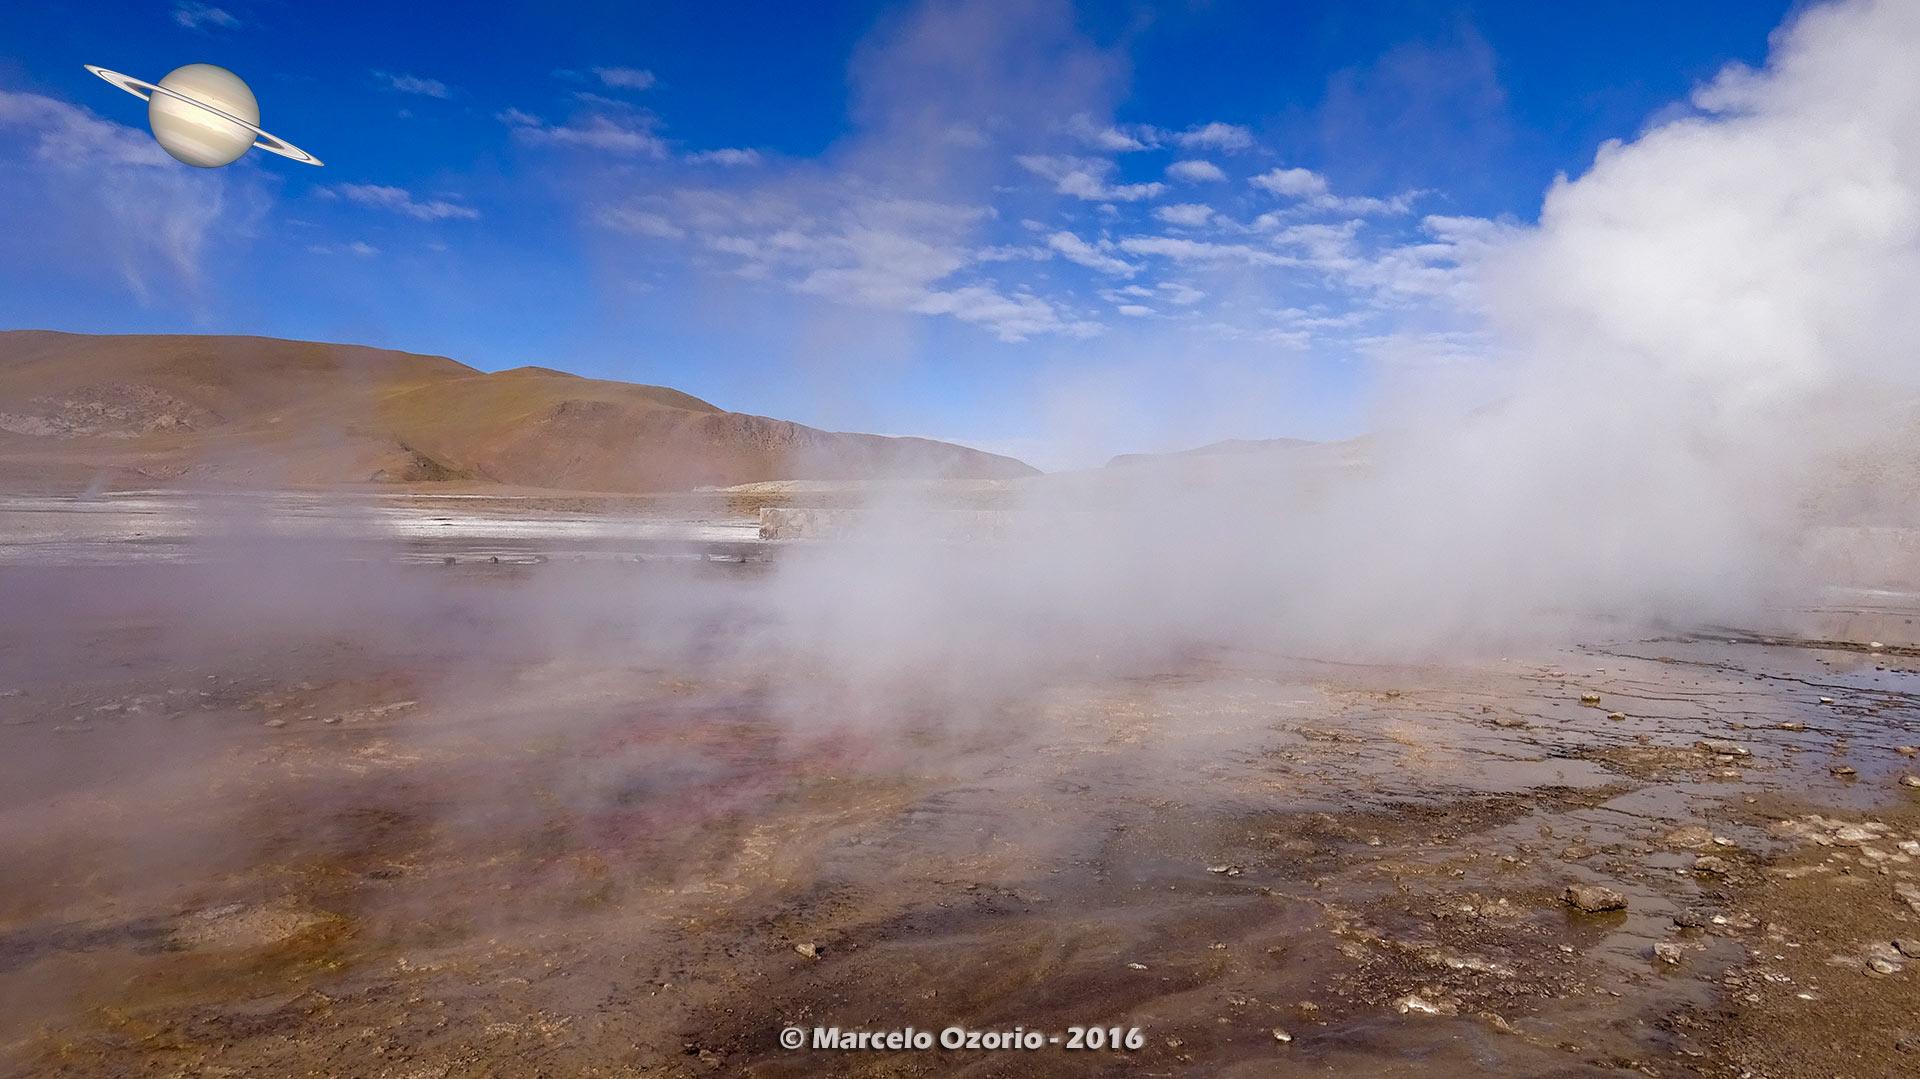 el tatio geysers atacama desert 31 - Os Surreais Gêiseres El Tatio - Deserto do Atacama - Chile